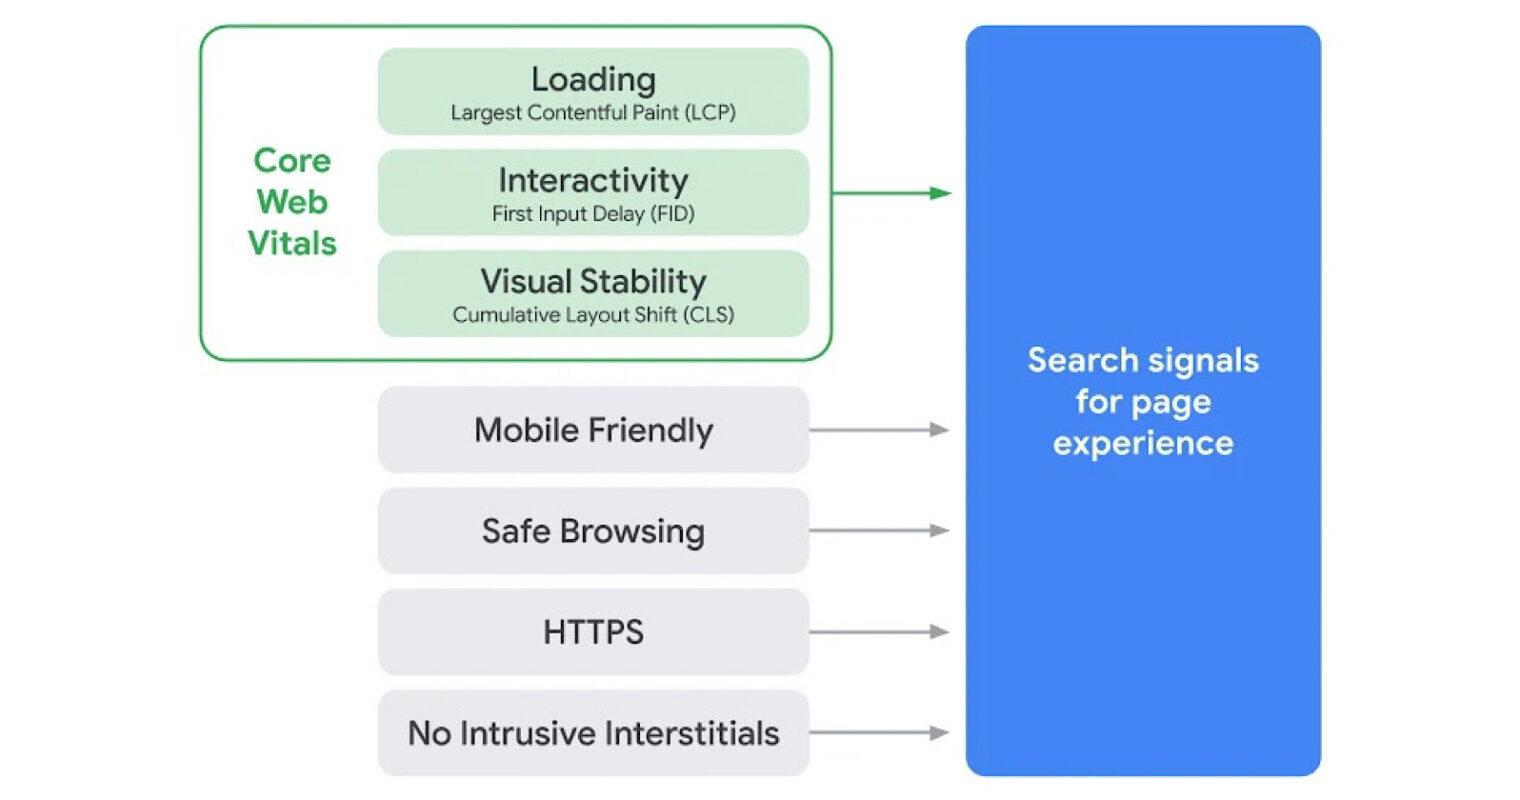 Core Web Vitals May 2021